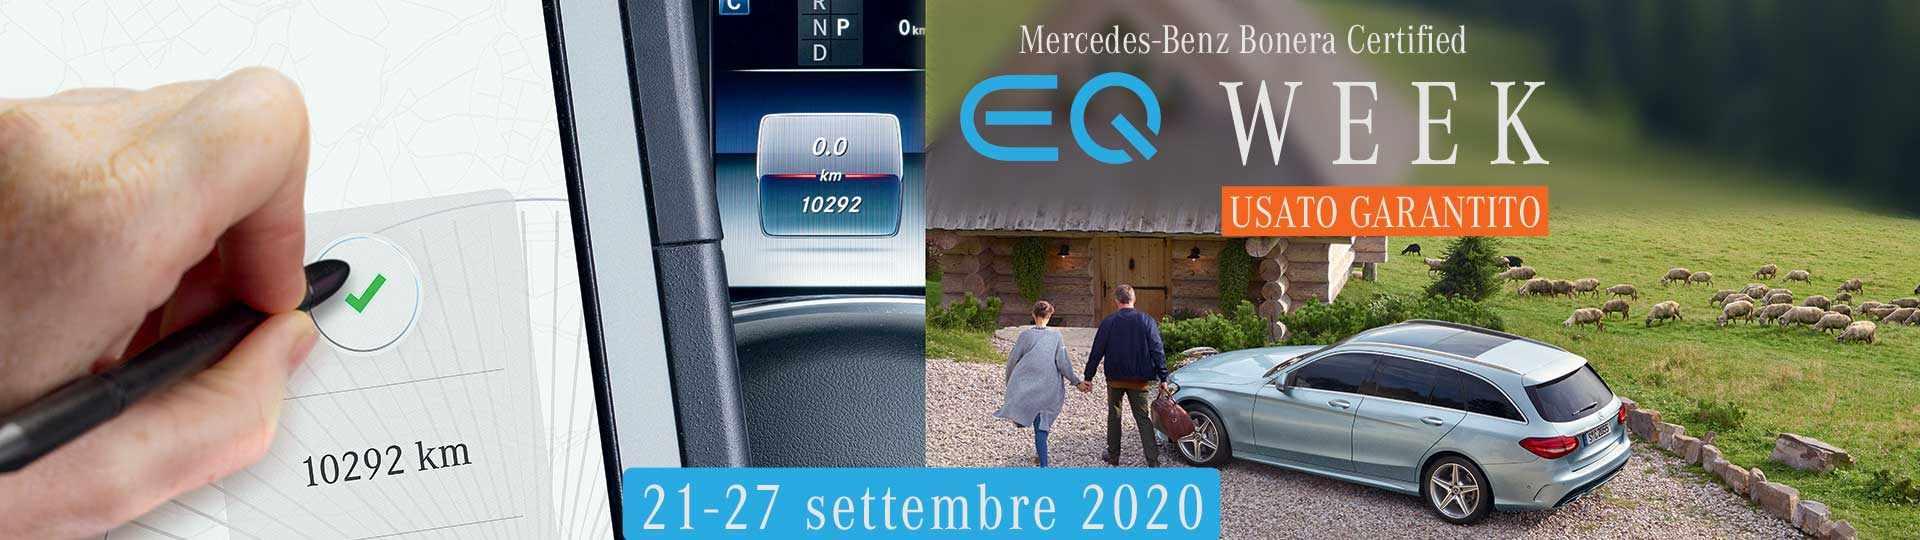 header_eq_week_certified_settembre_2020.jpg